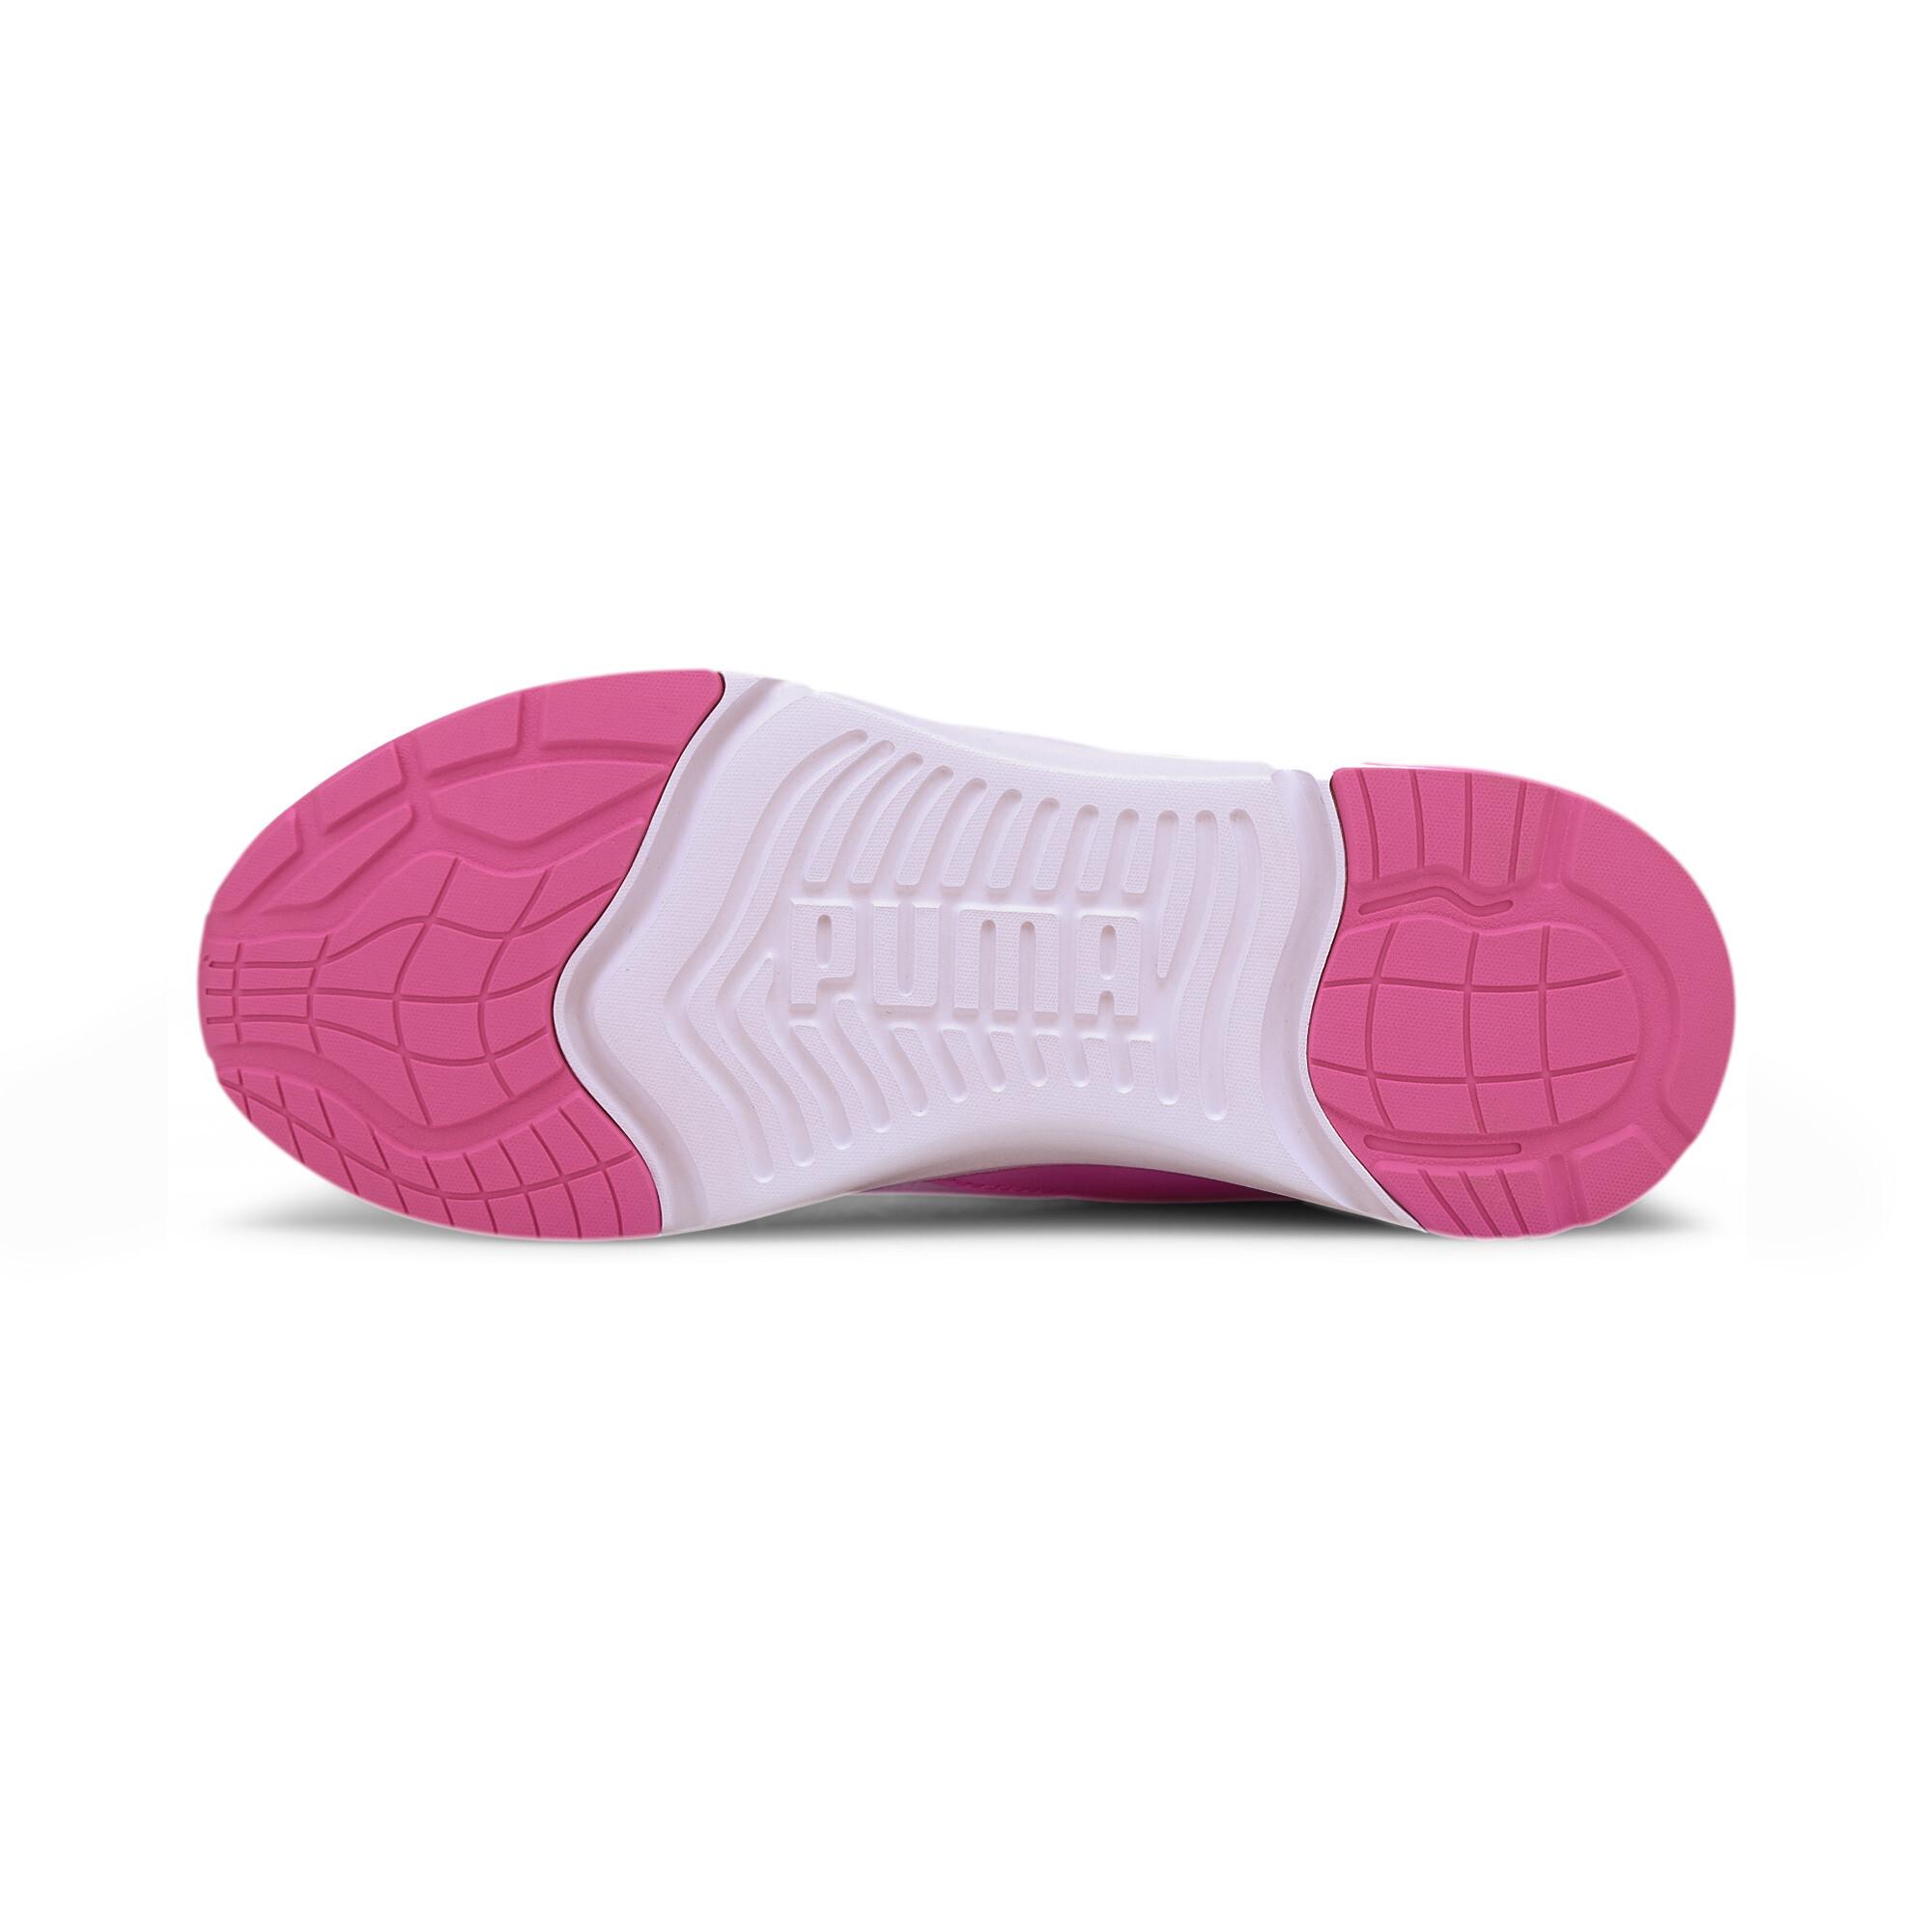 PUMA-Women-039-s-CELL-Initiate-Fade-Training-Shoes thumbnail 6